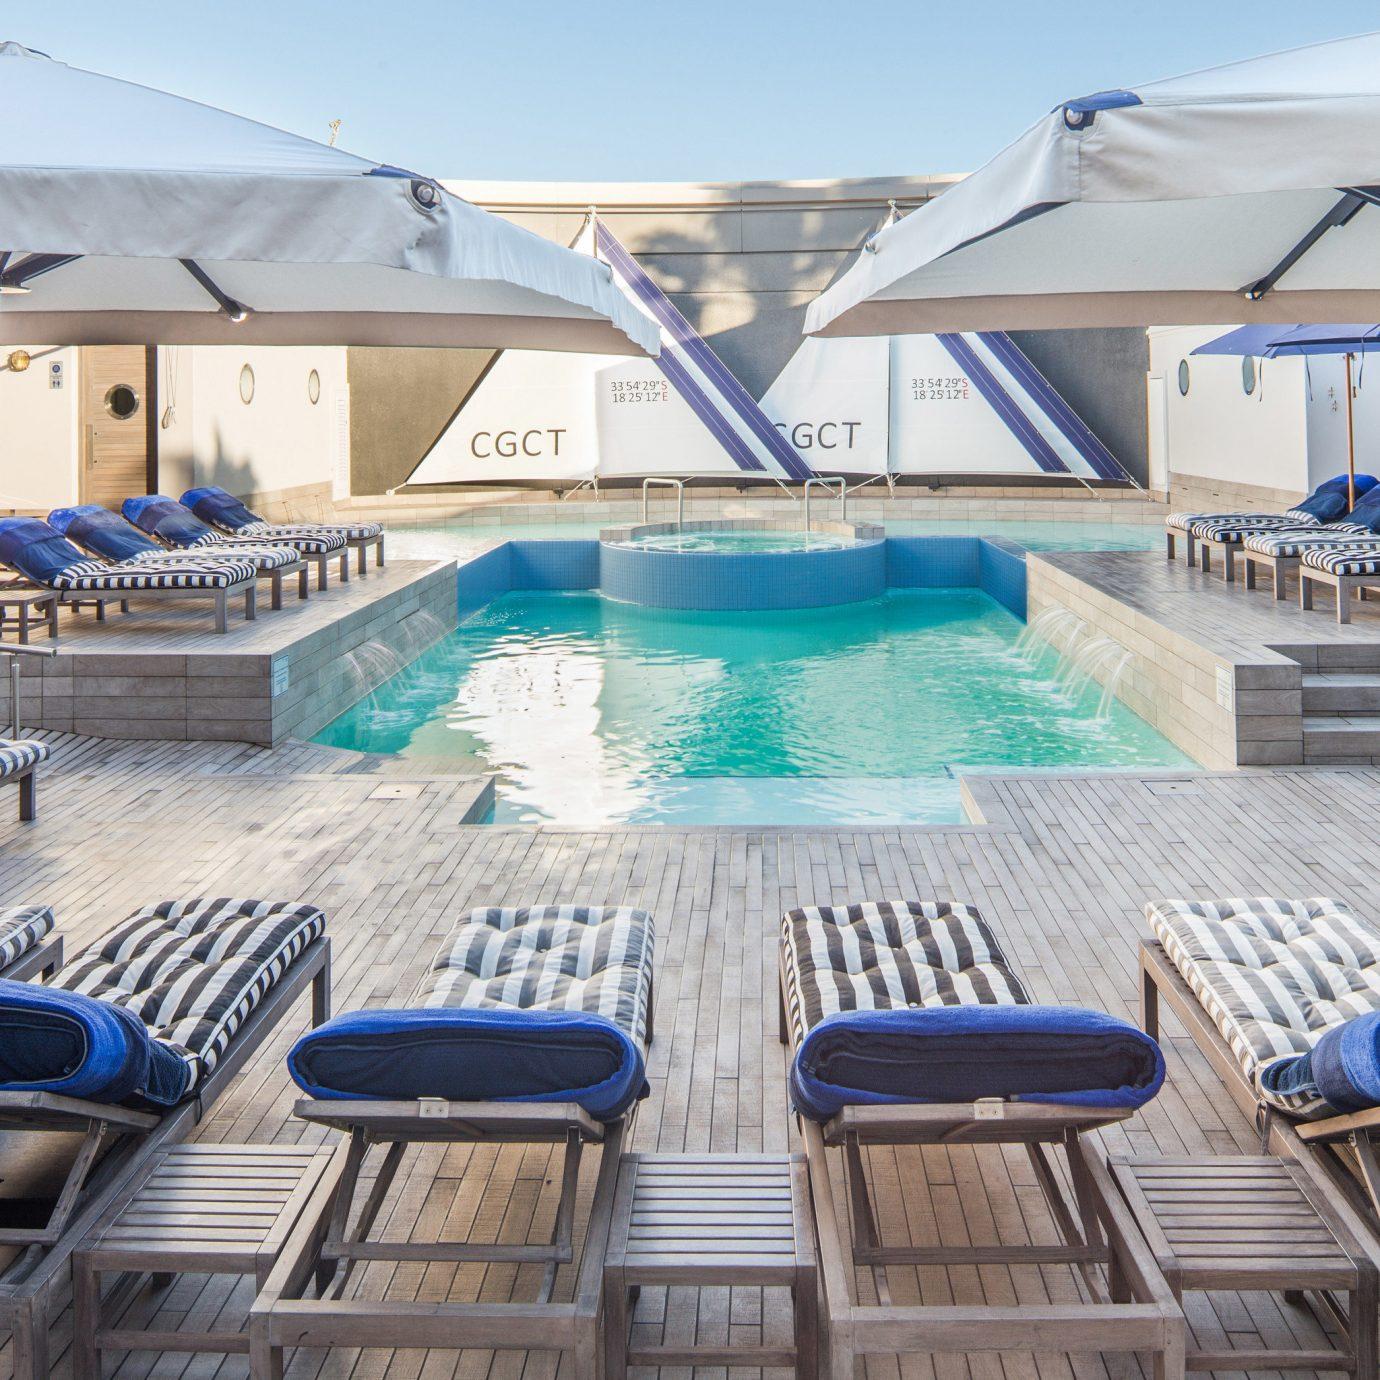 sky swimming pool leisure property marina dock Resort vehicle yacht passenger ship Villa blue